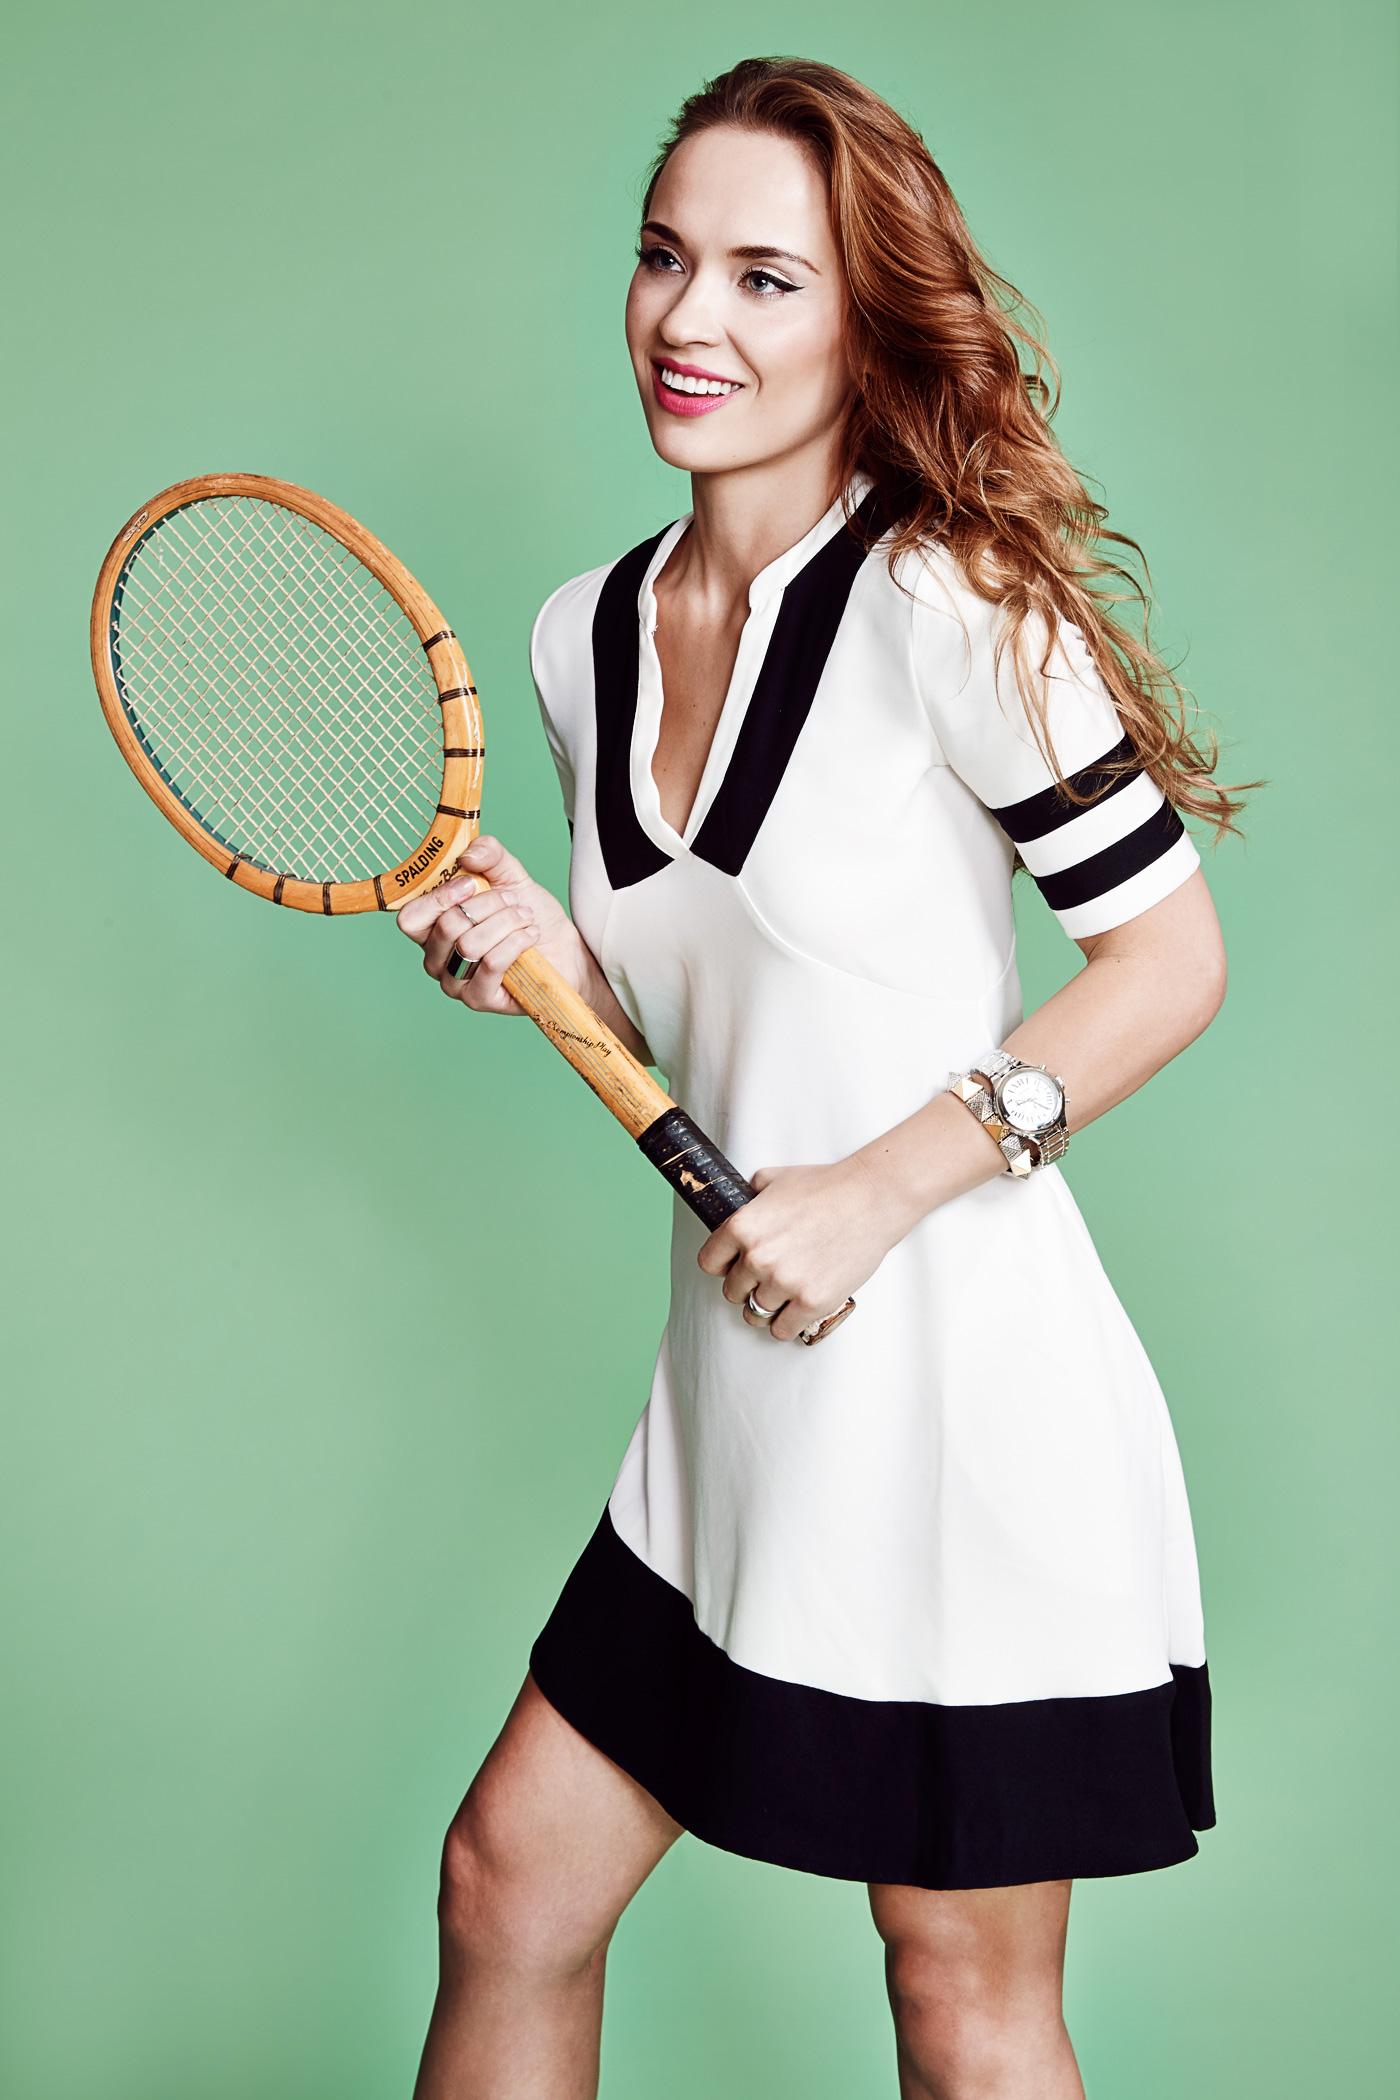 Kat_Tennis_1_Web.jpg